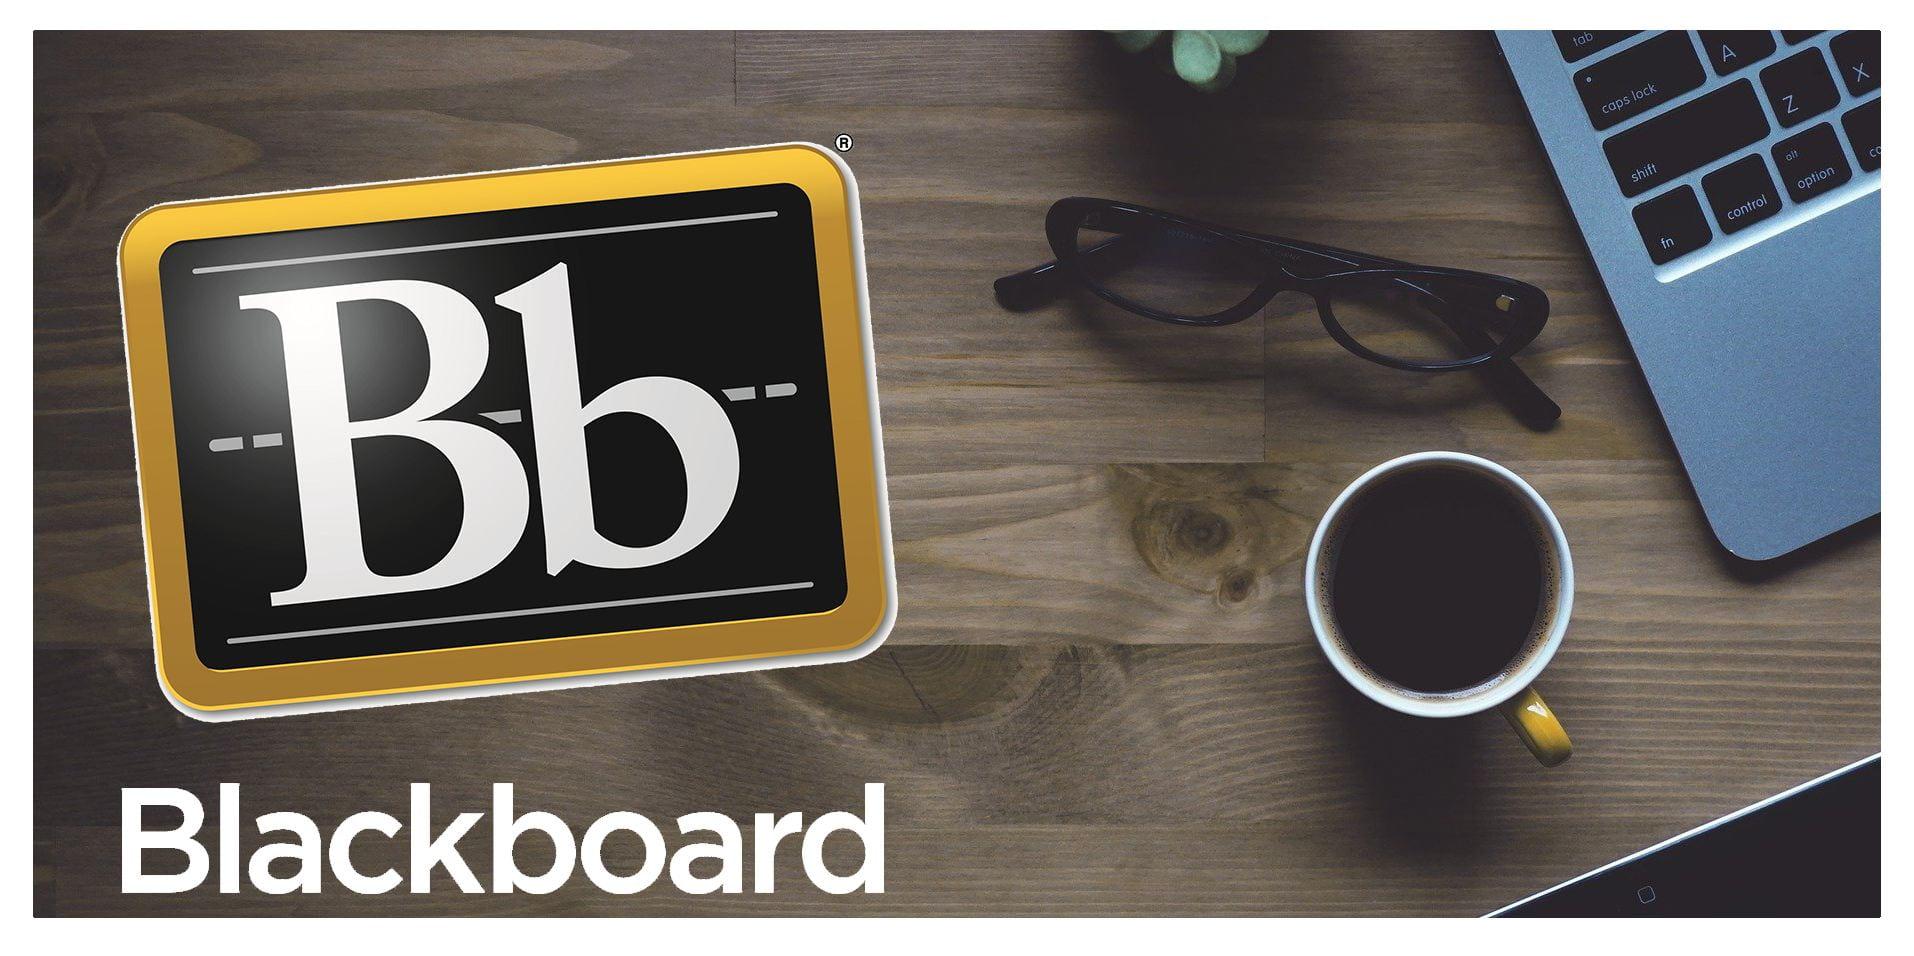 Laptop and Blackboard logo.